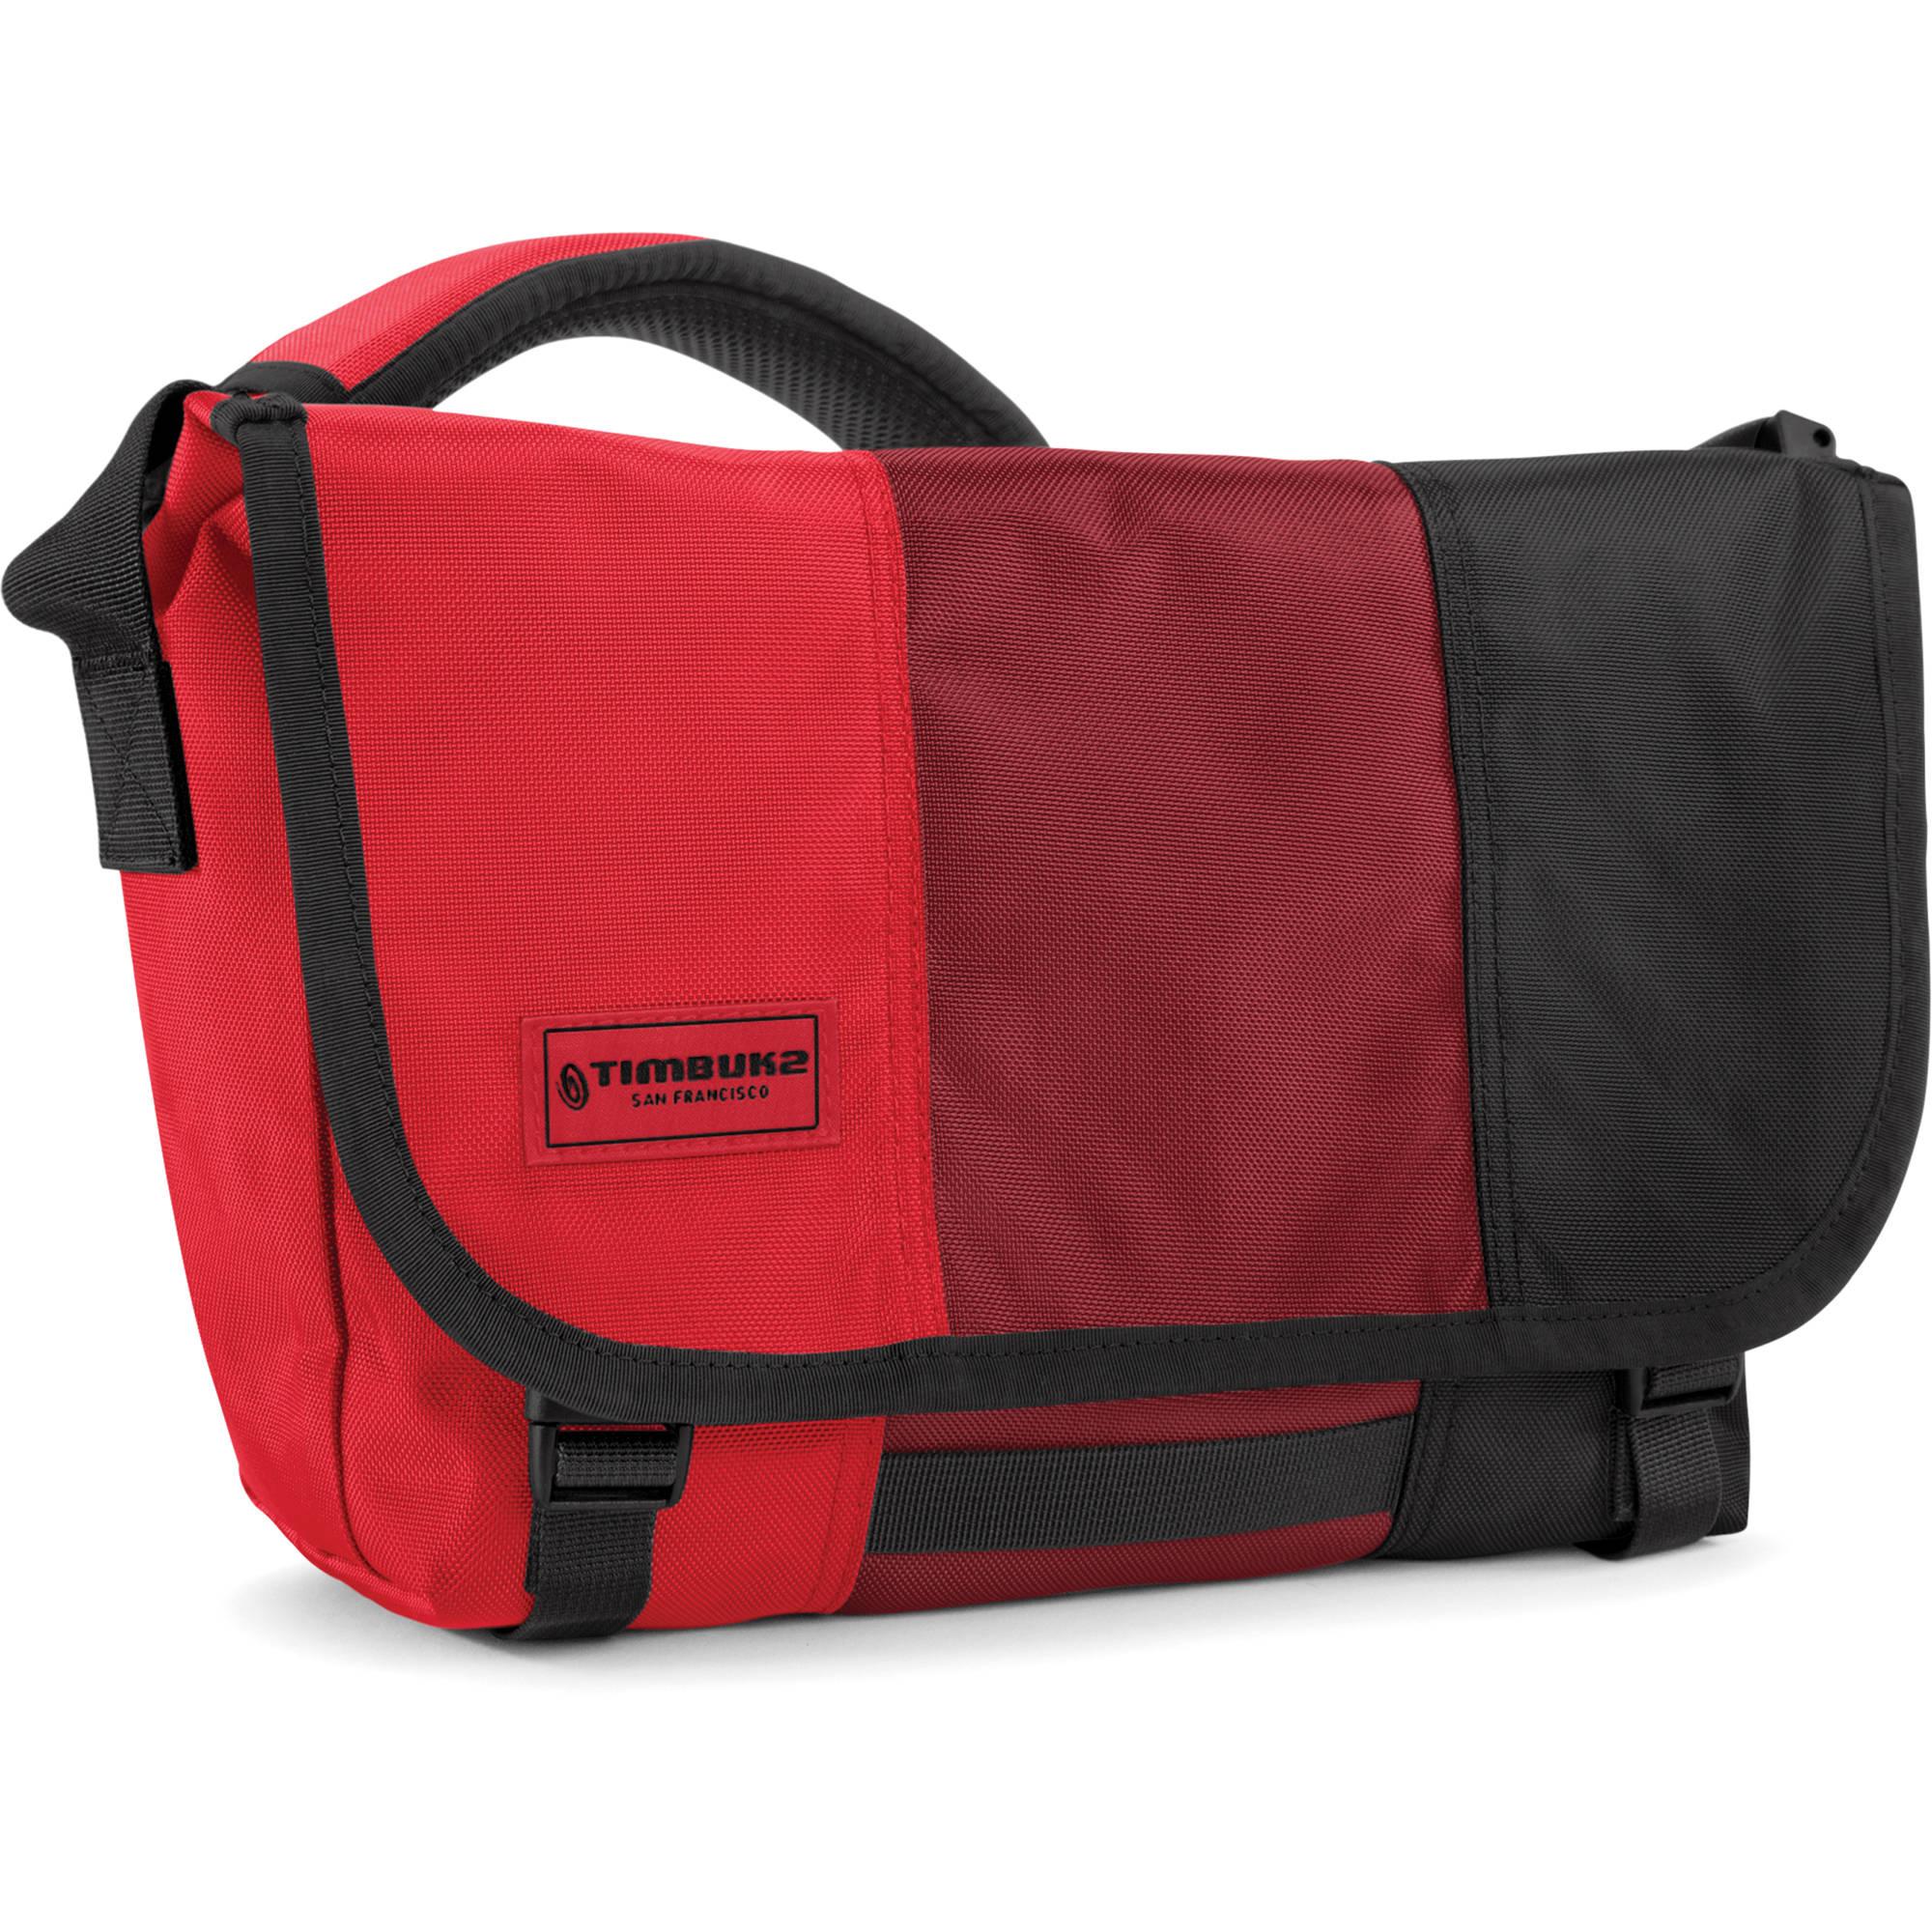 Timbuk2 Classic Messenger Bag (Extra Small, Diablo) 116-1-6061